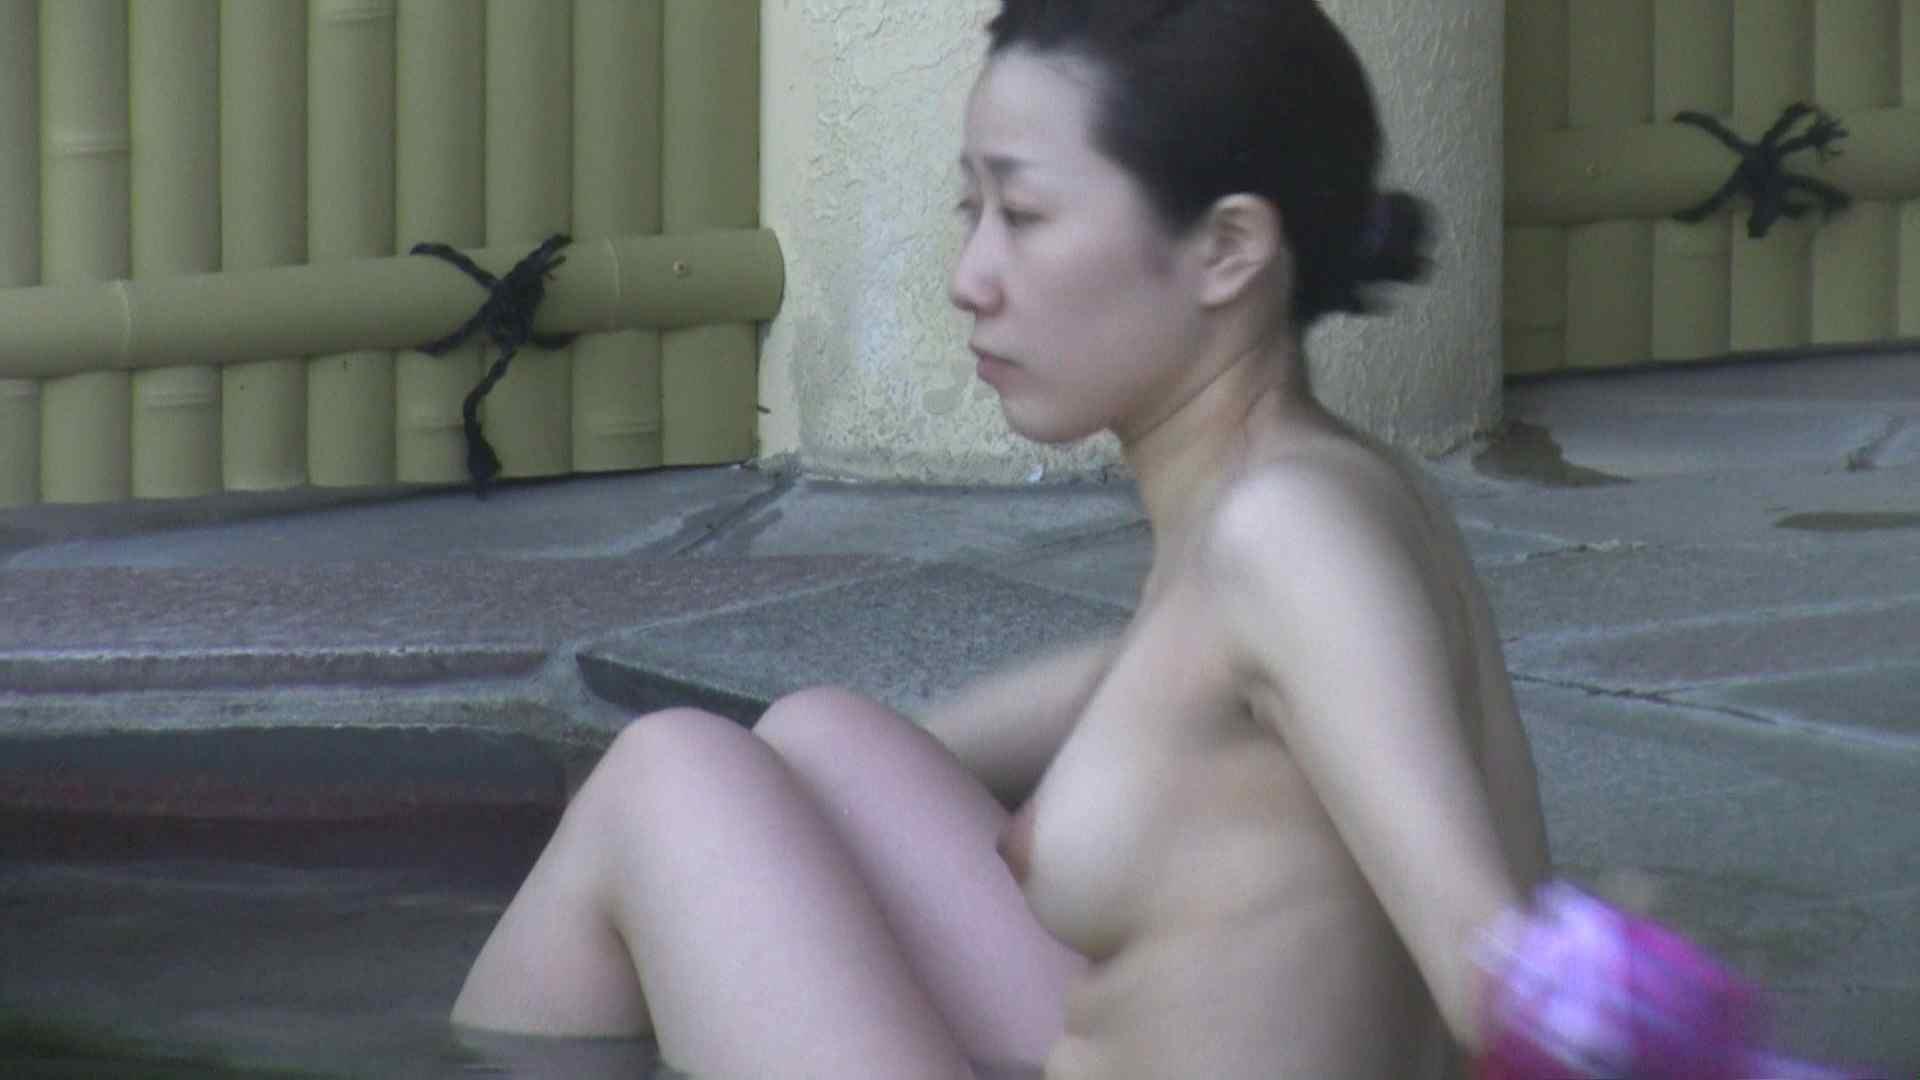 Aquaな露天風呂Vol.88【VIP限定】 OLのエロ生活 | 露天風呂  61連発 16